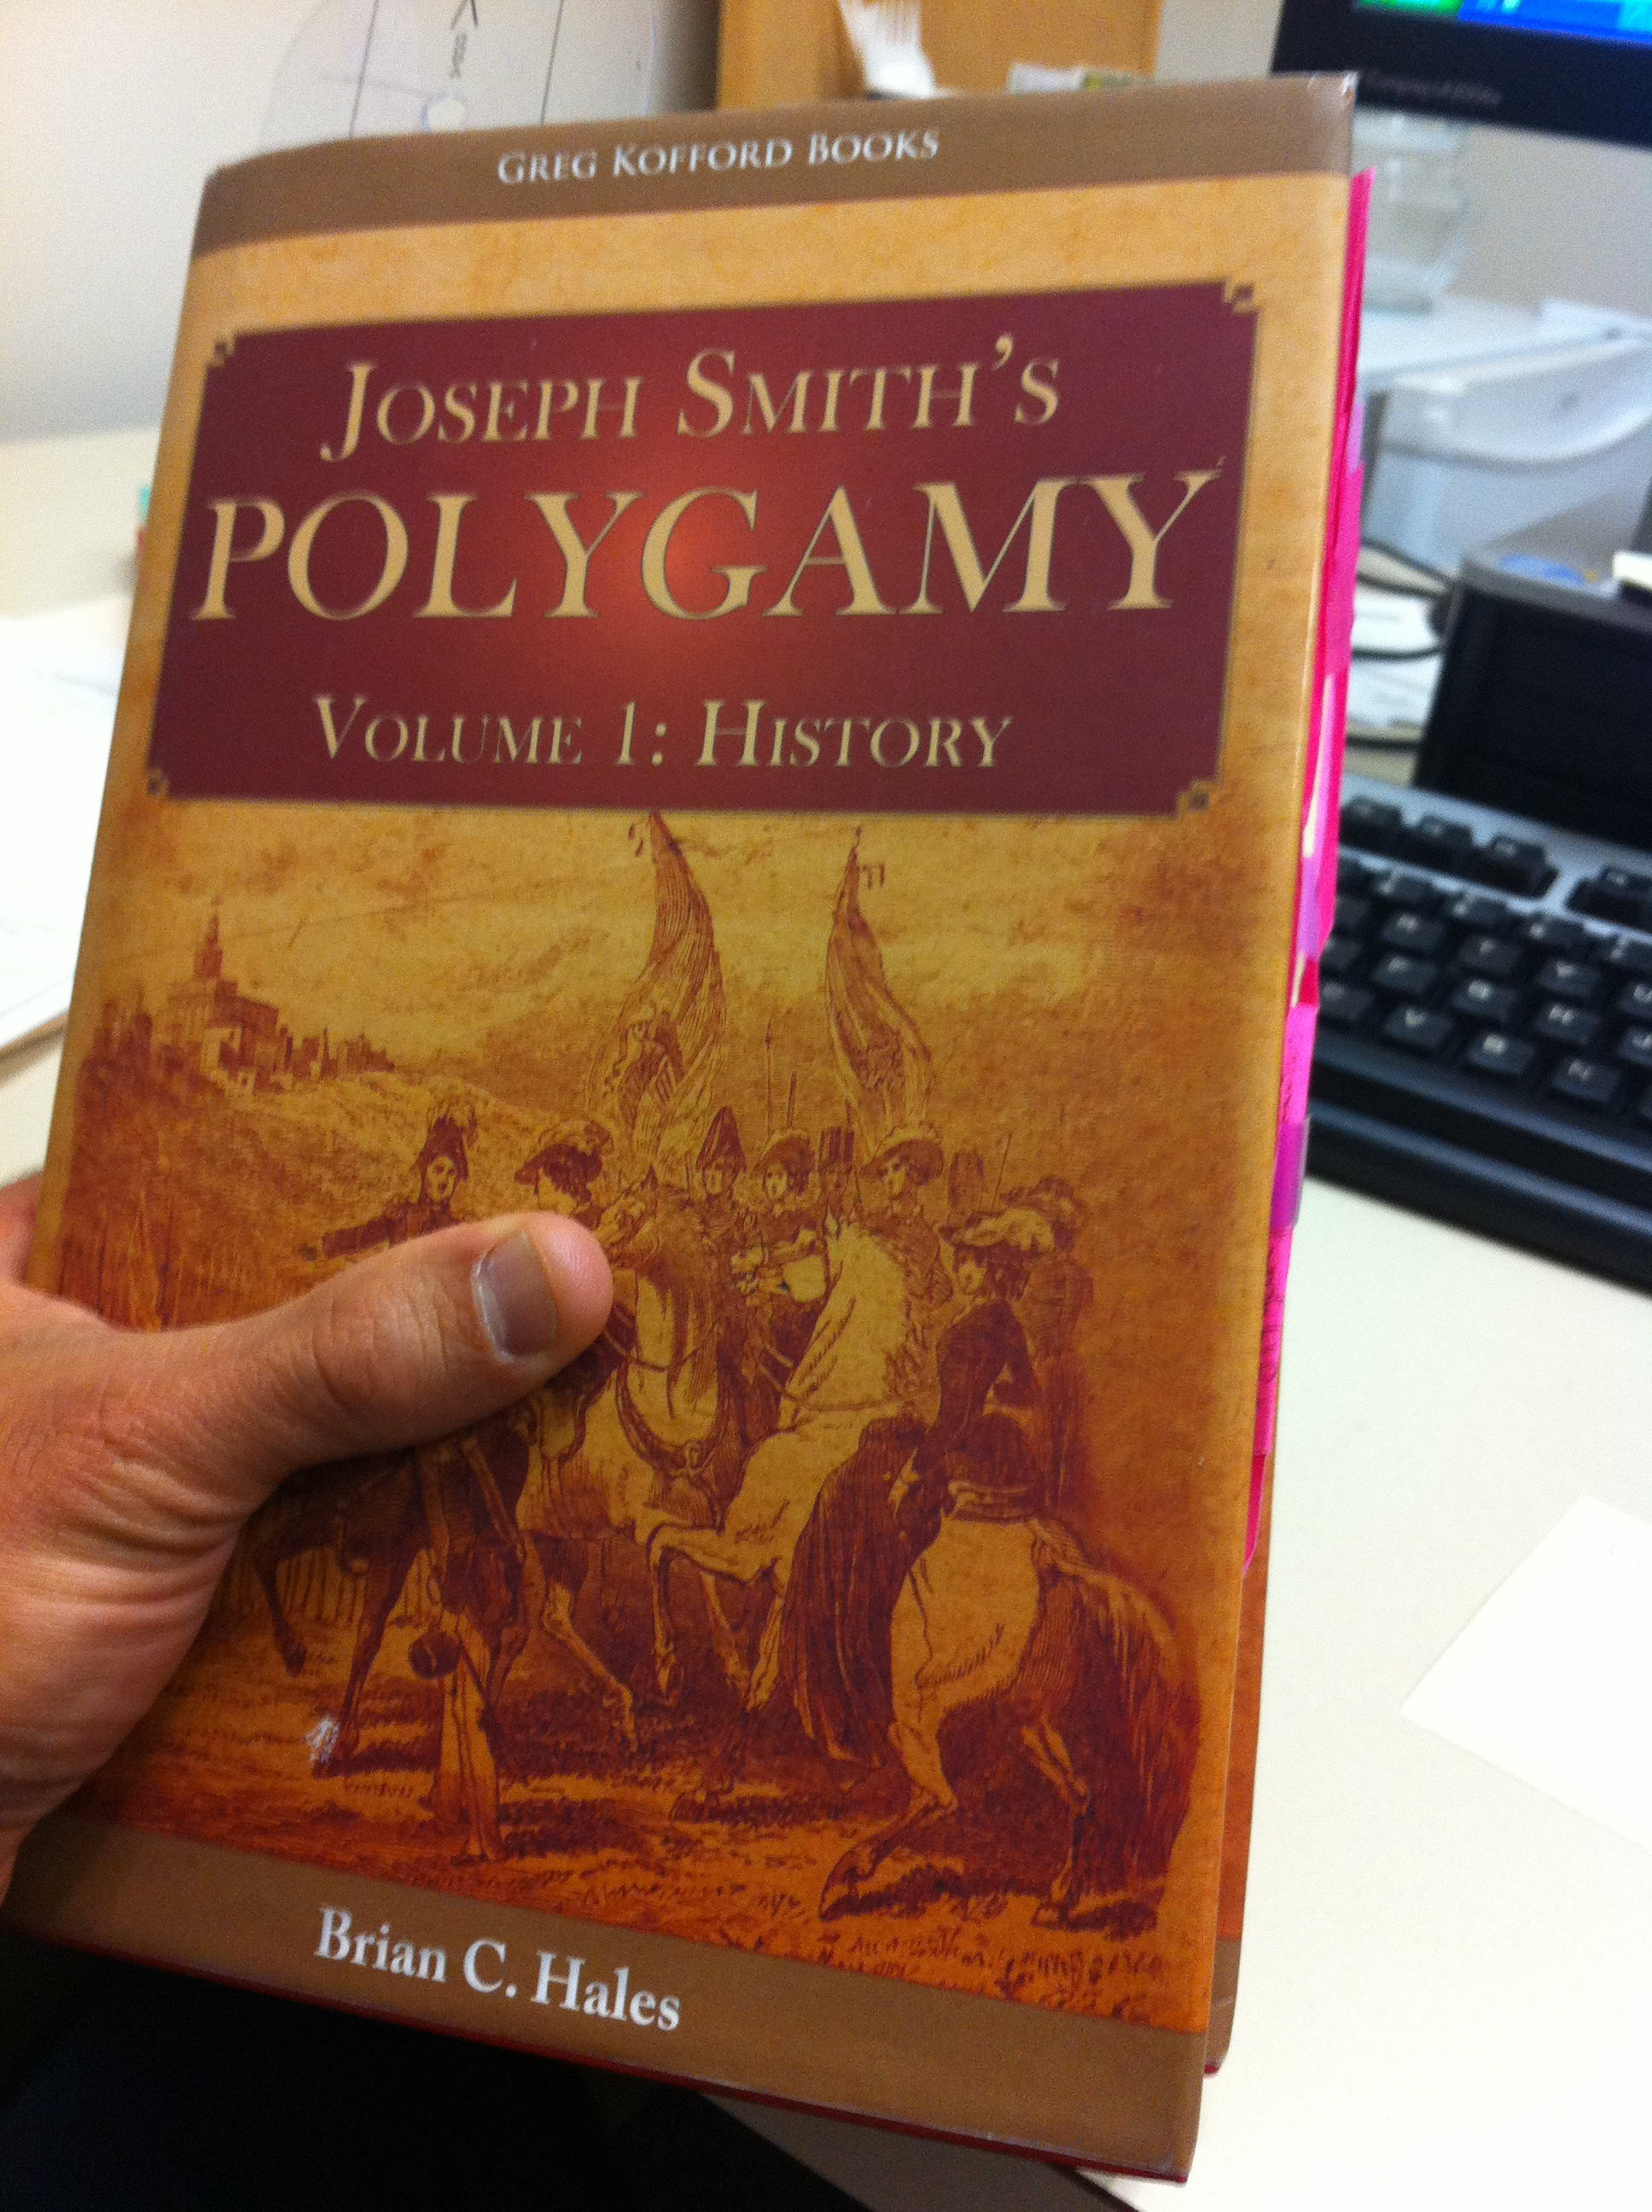 JOSEPH SMITH'S POLYGAMY, VOLUME 1:  HISTORY – A BOOK REVIEW